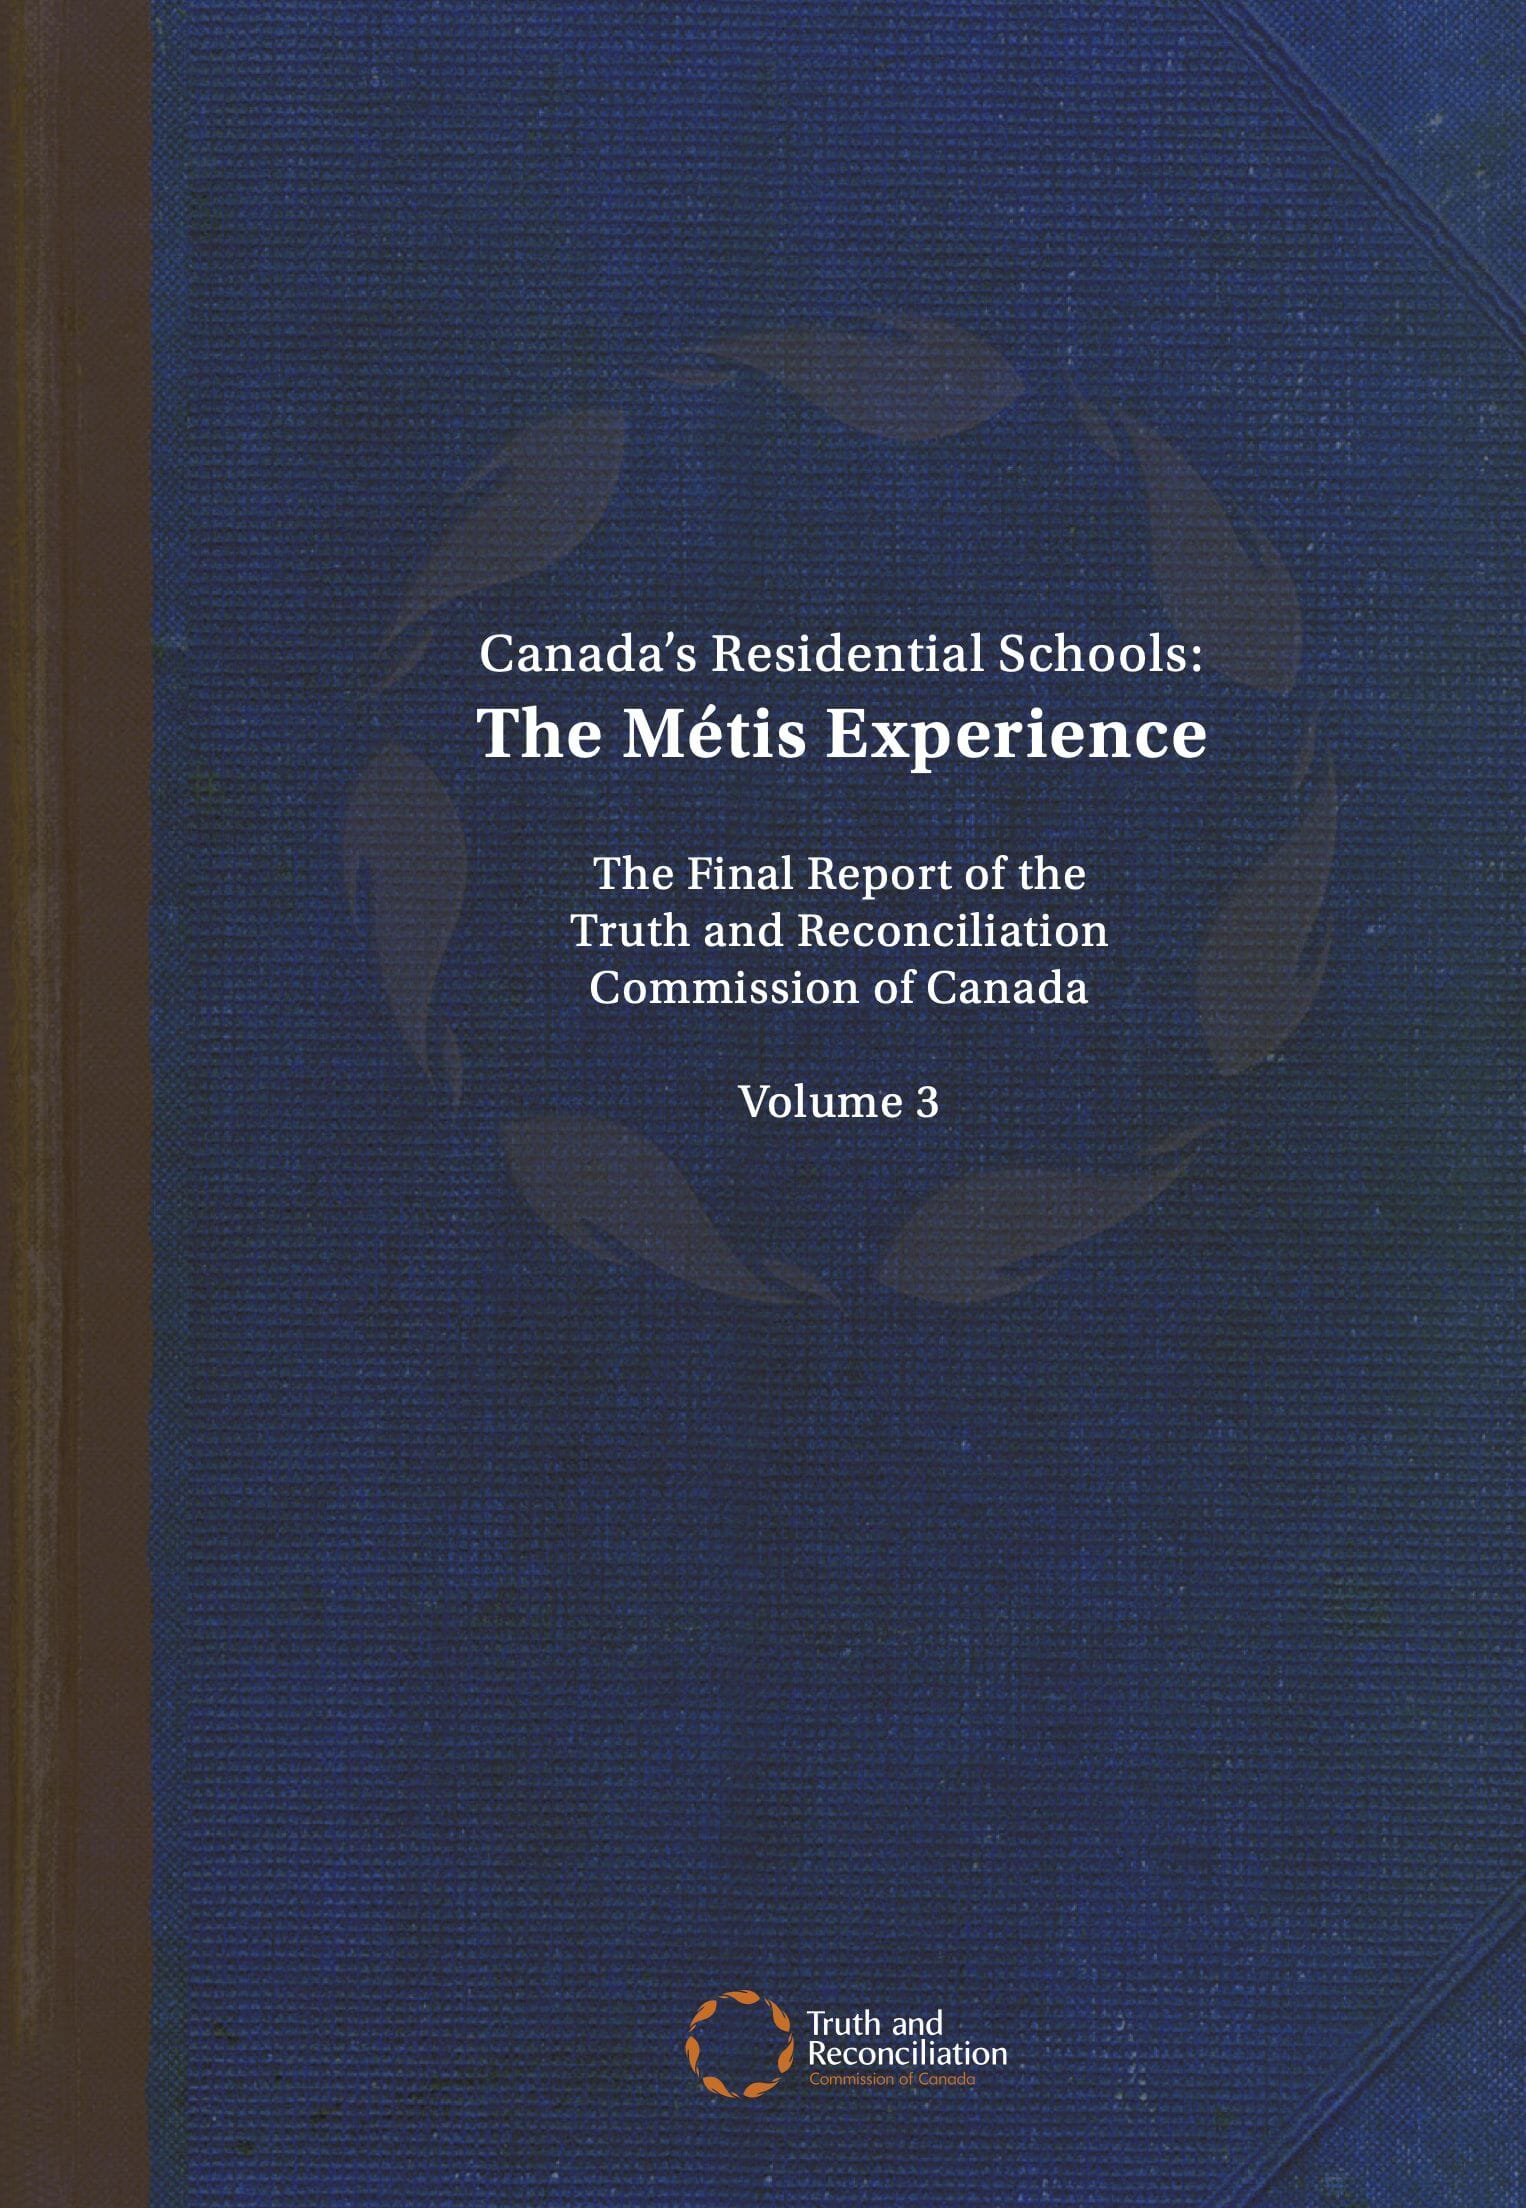 Canada's Residential Schools: The Métis Experience